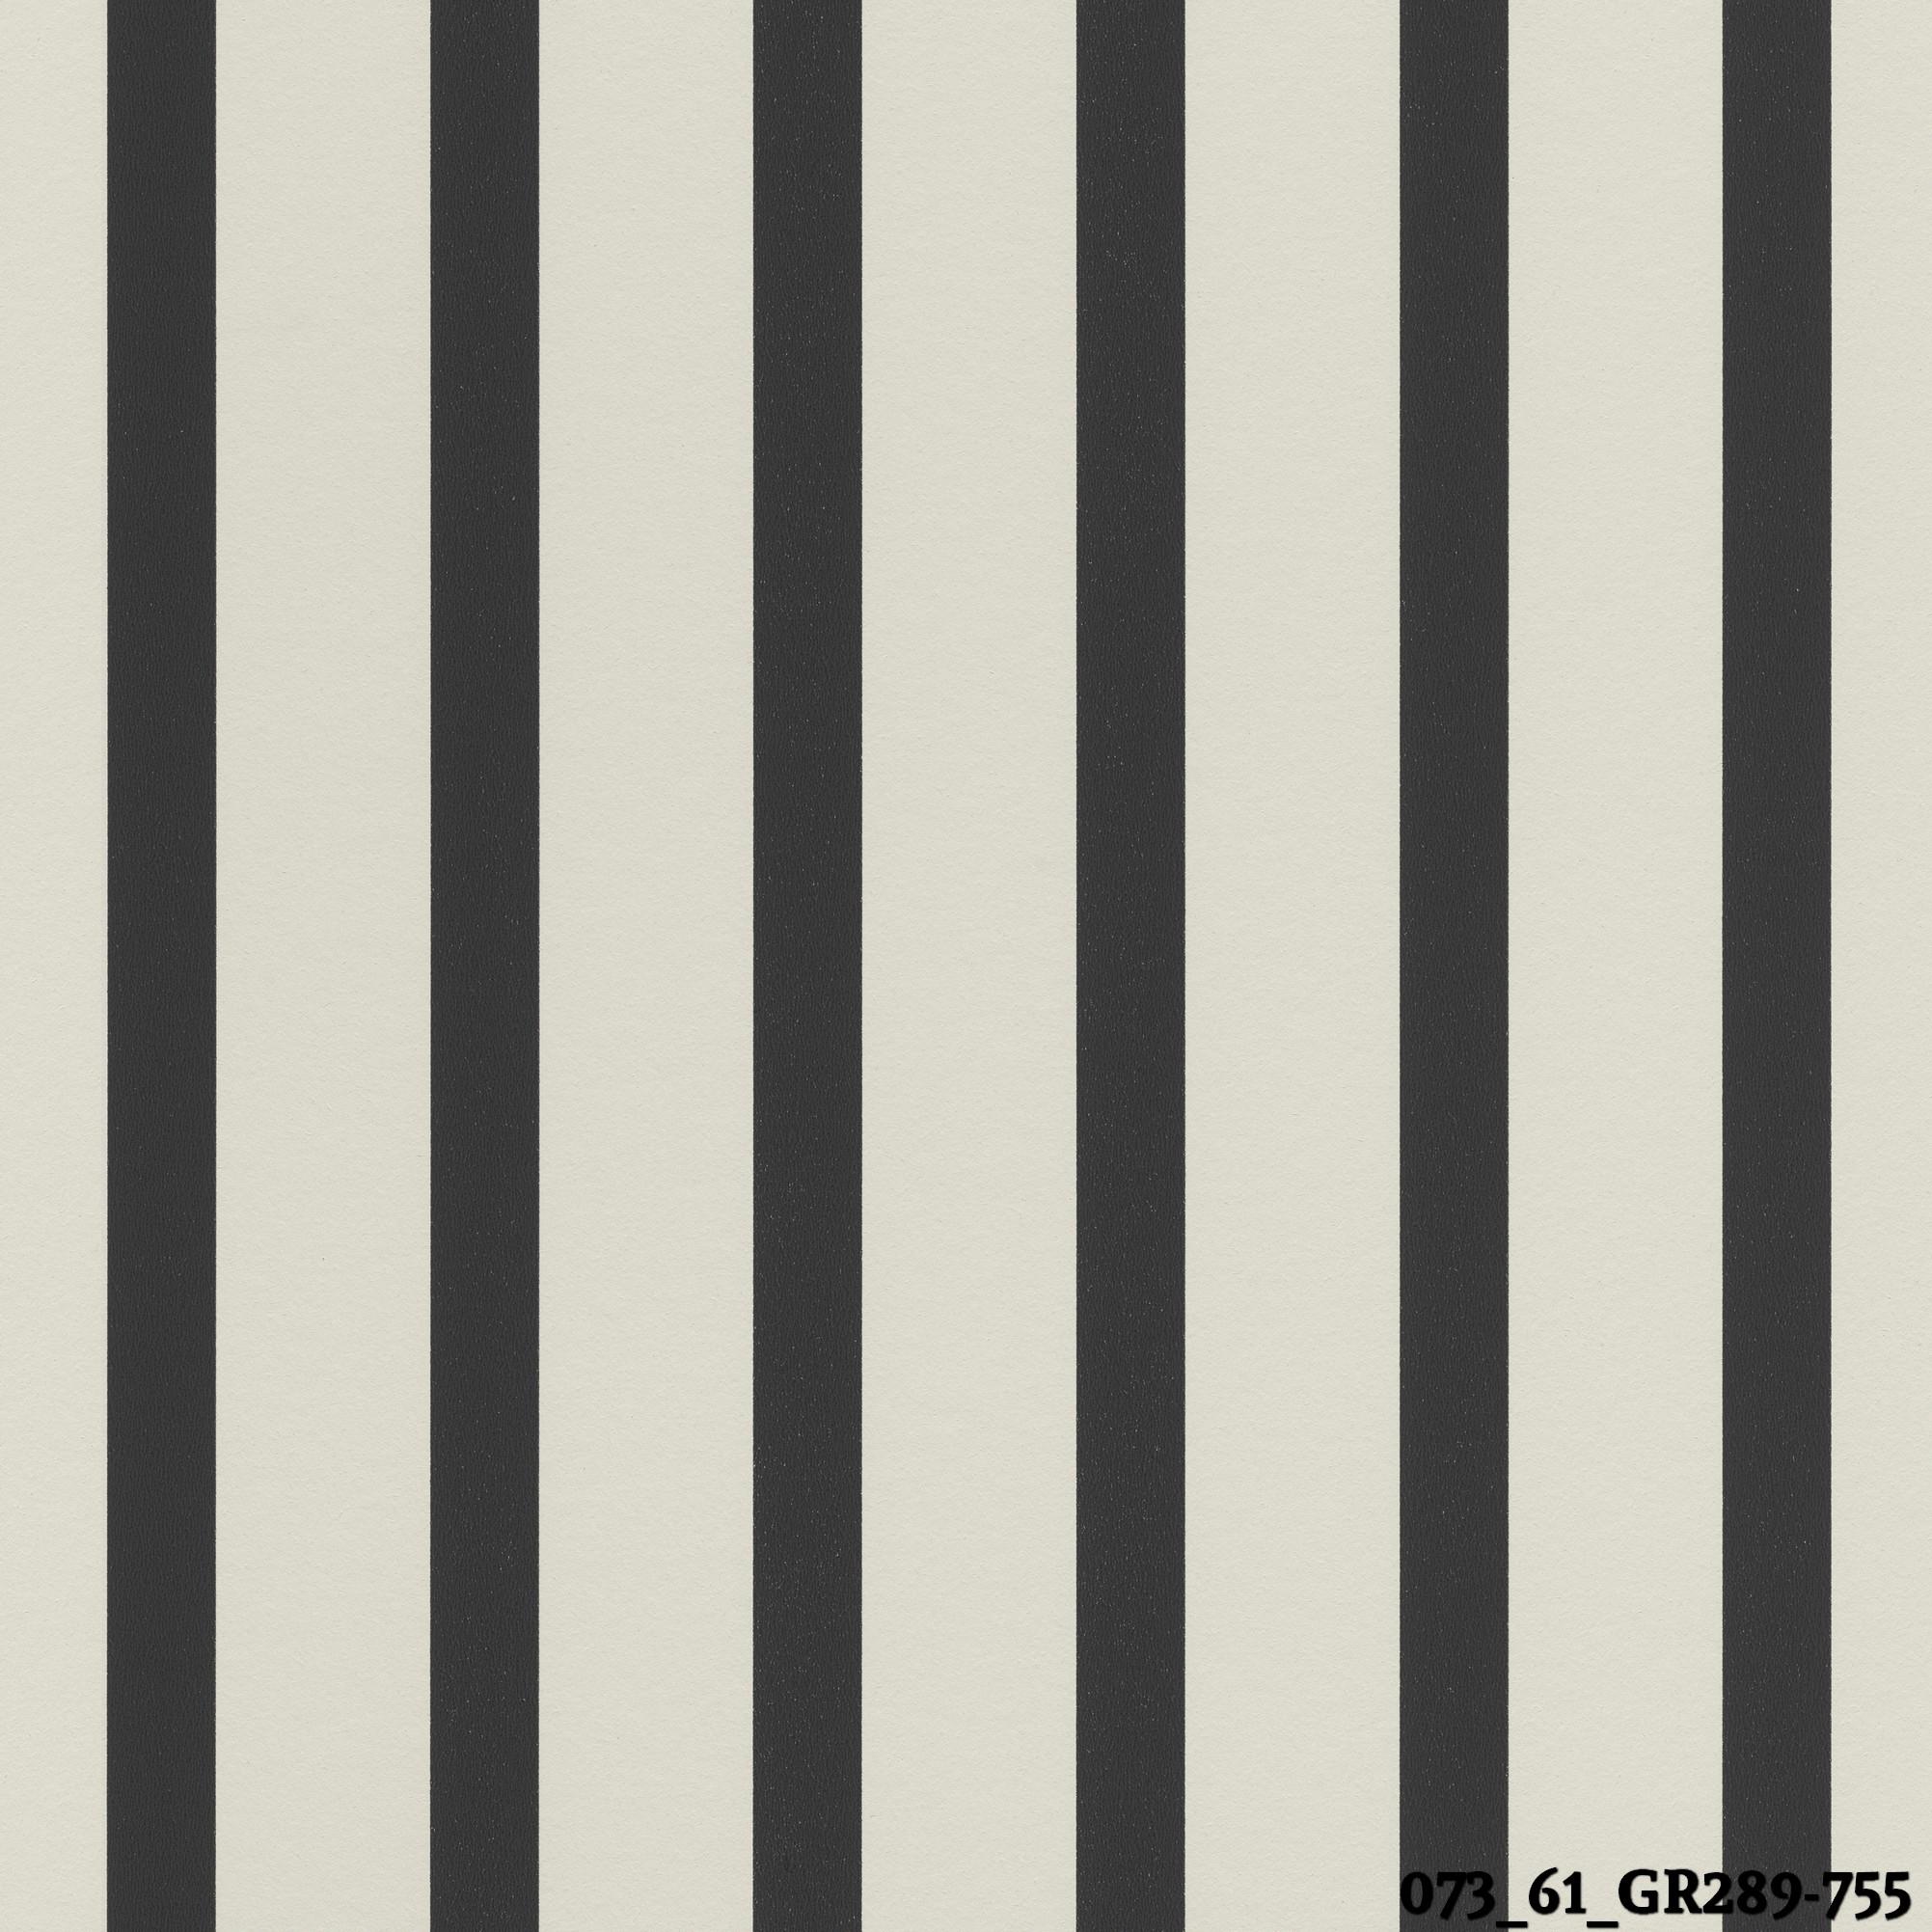 GR289-755